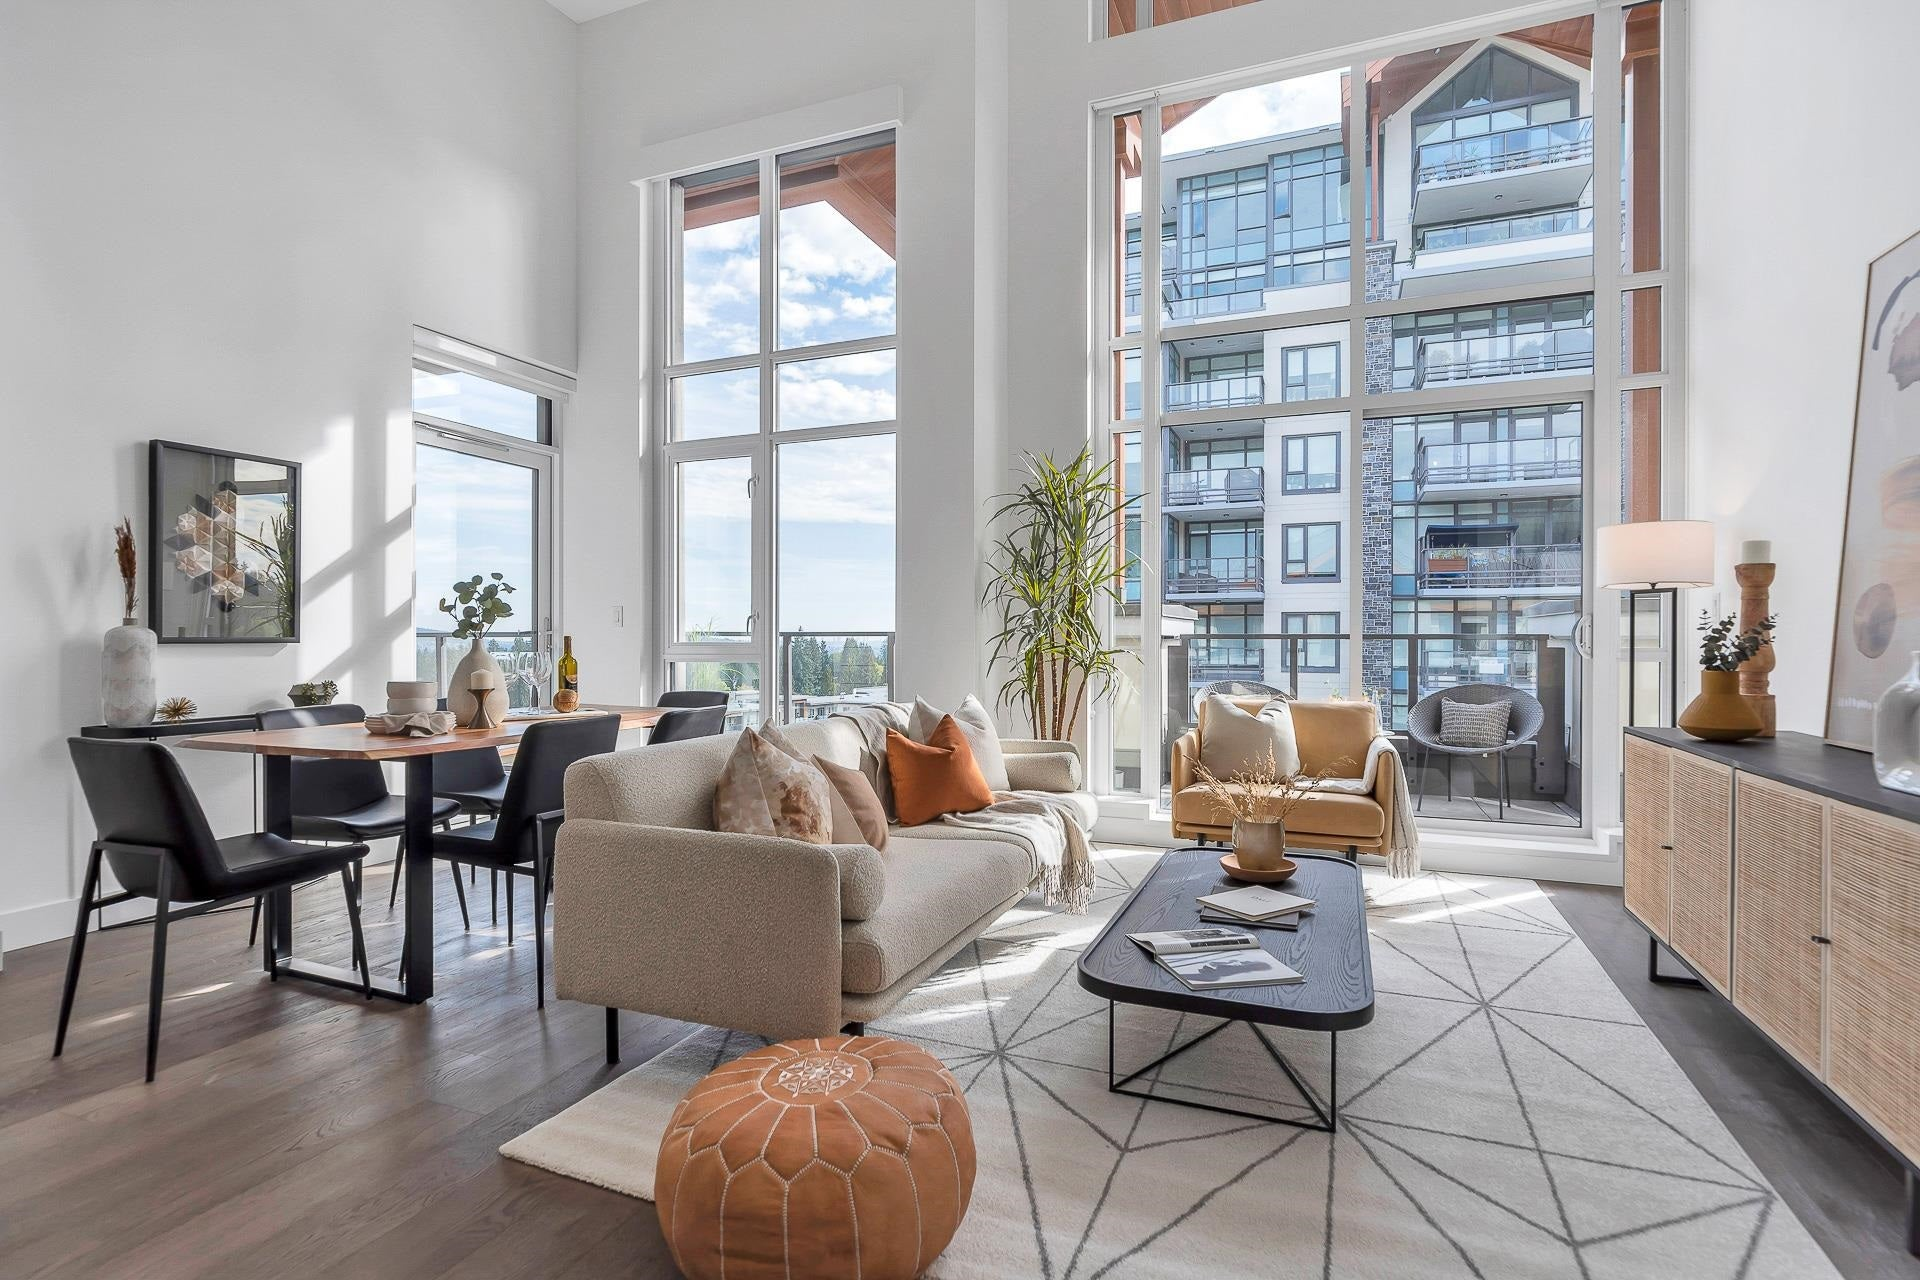 702 2780 VALLEY CENTRE AVENUE - Lynn Valley Apartment/Condo for sale, 3 Bedrooms (R2622279) - #4